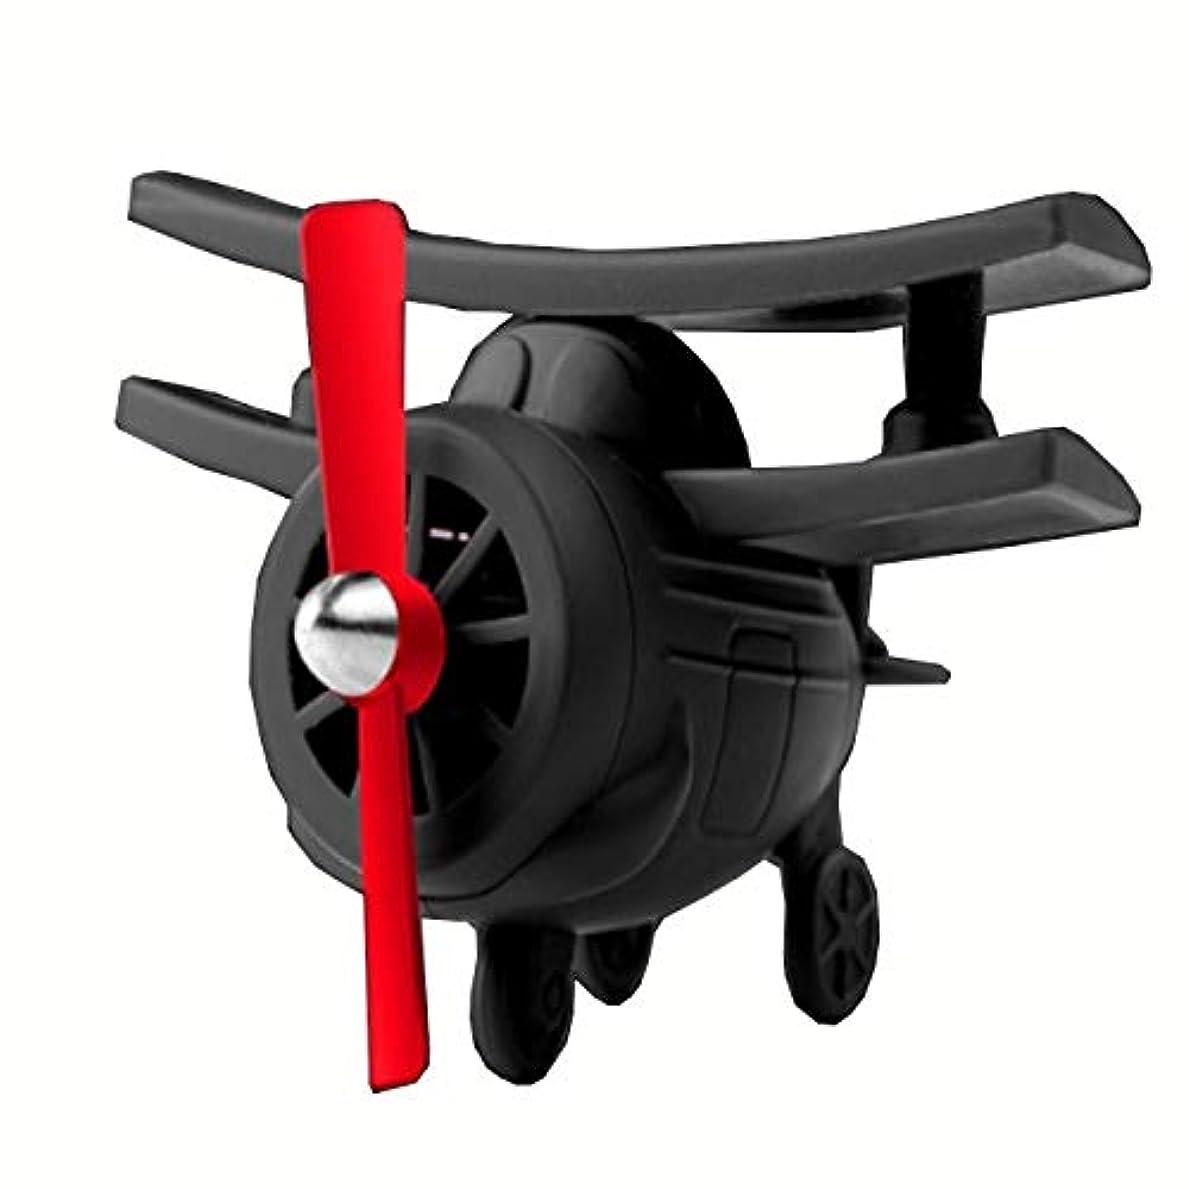 UTST 車 用 ディフューザー 空気清浄 アロマ 精油 おもしろ 飛行機 香り 脱臭 室内 消臭 芳香剤 などに (ブラック, アロマ飛行)